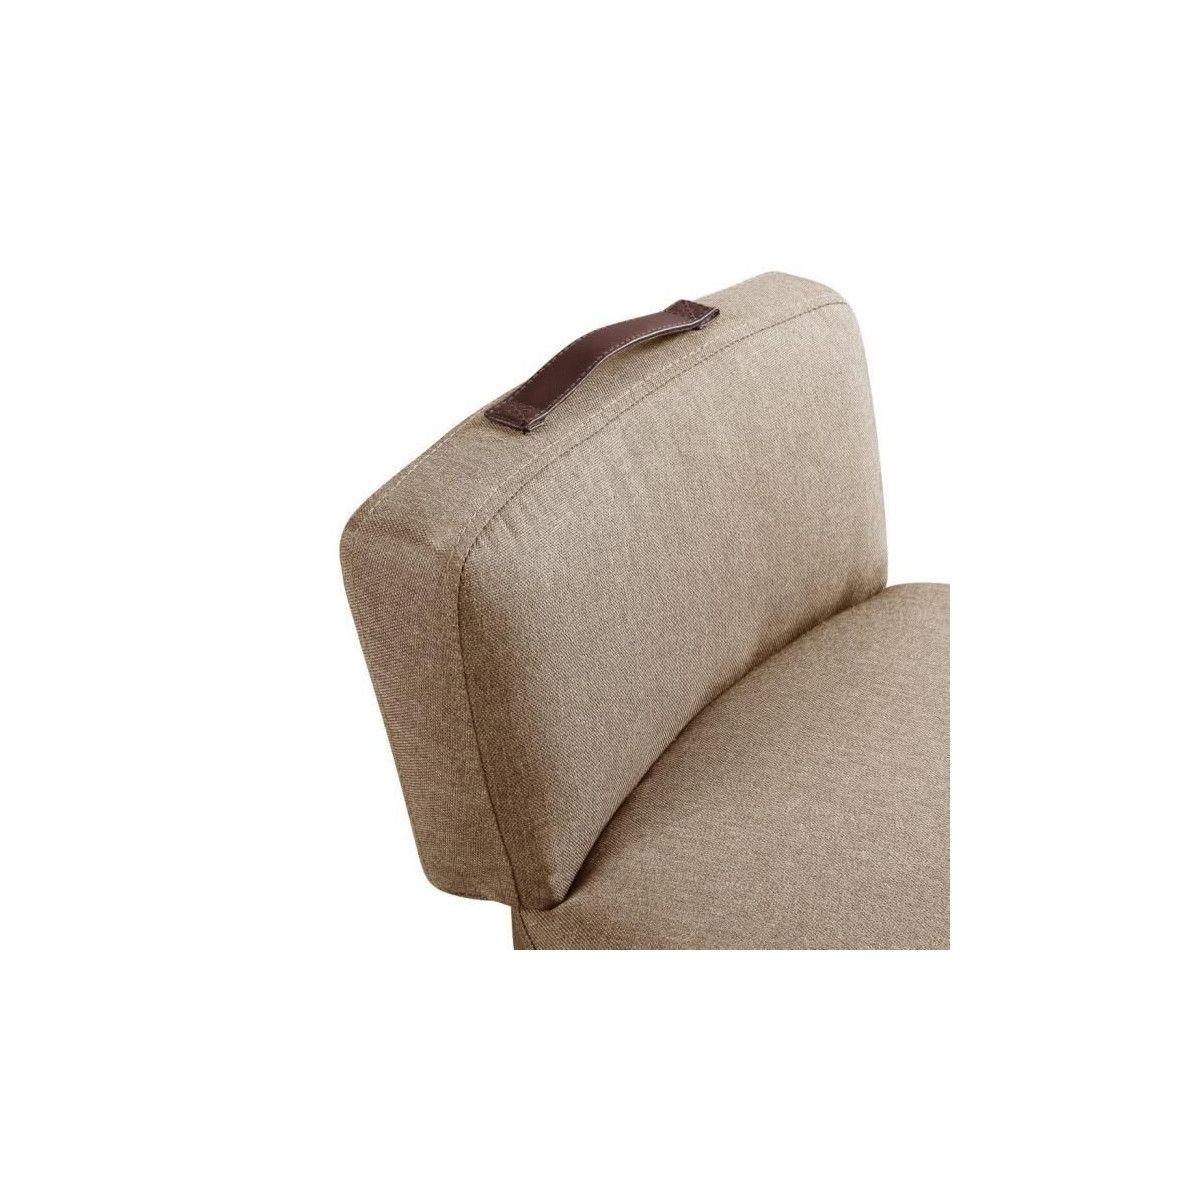 LILO1 Fauteuil pieds metal Tissu taupe L 44 x P 45 x H 63 cm